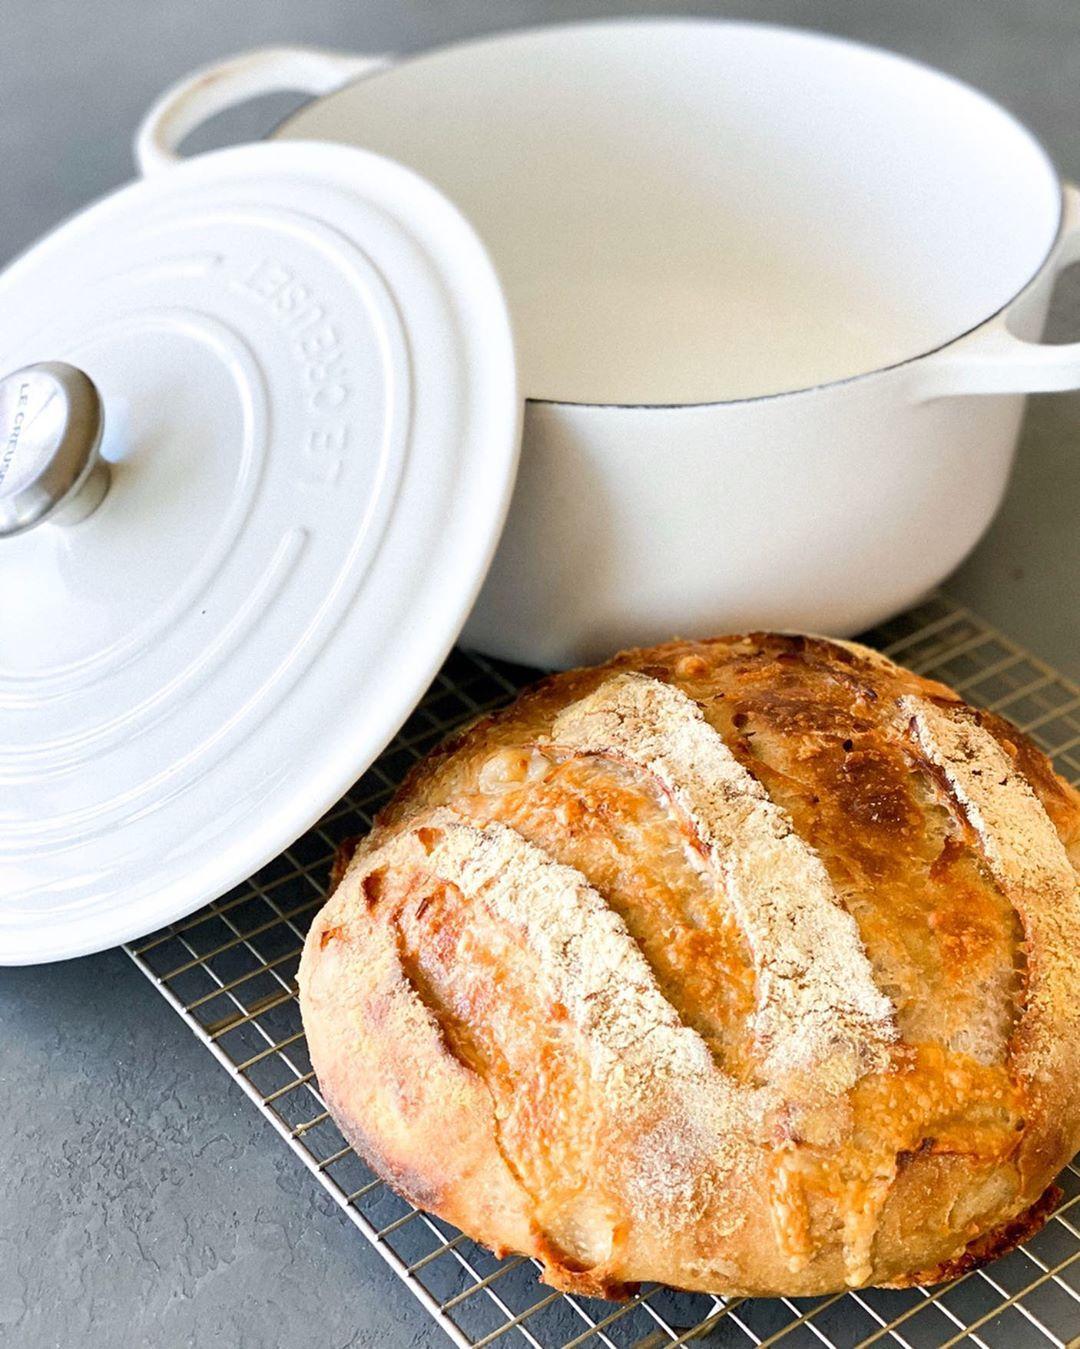 no knead cheddar sage dutch oven bread recipe cooked in a le creuset round dutch ove dutch oven bread enameled cast iron dutch oven recipes dutch oven recipes no knead cheddar sage dutch oven bread